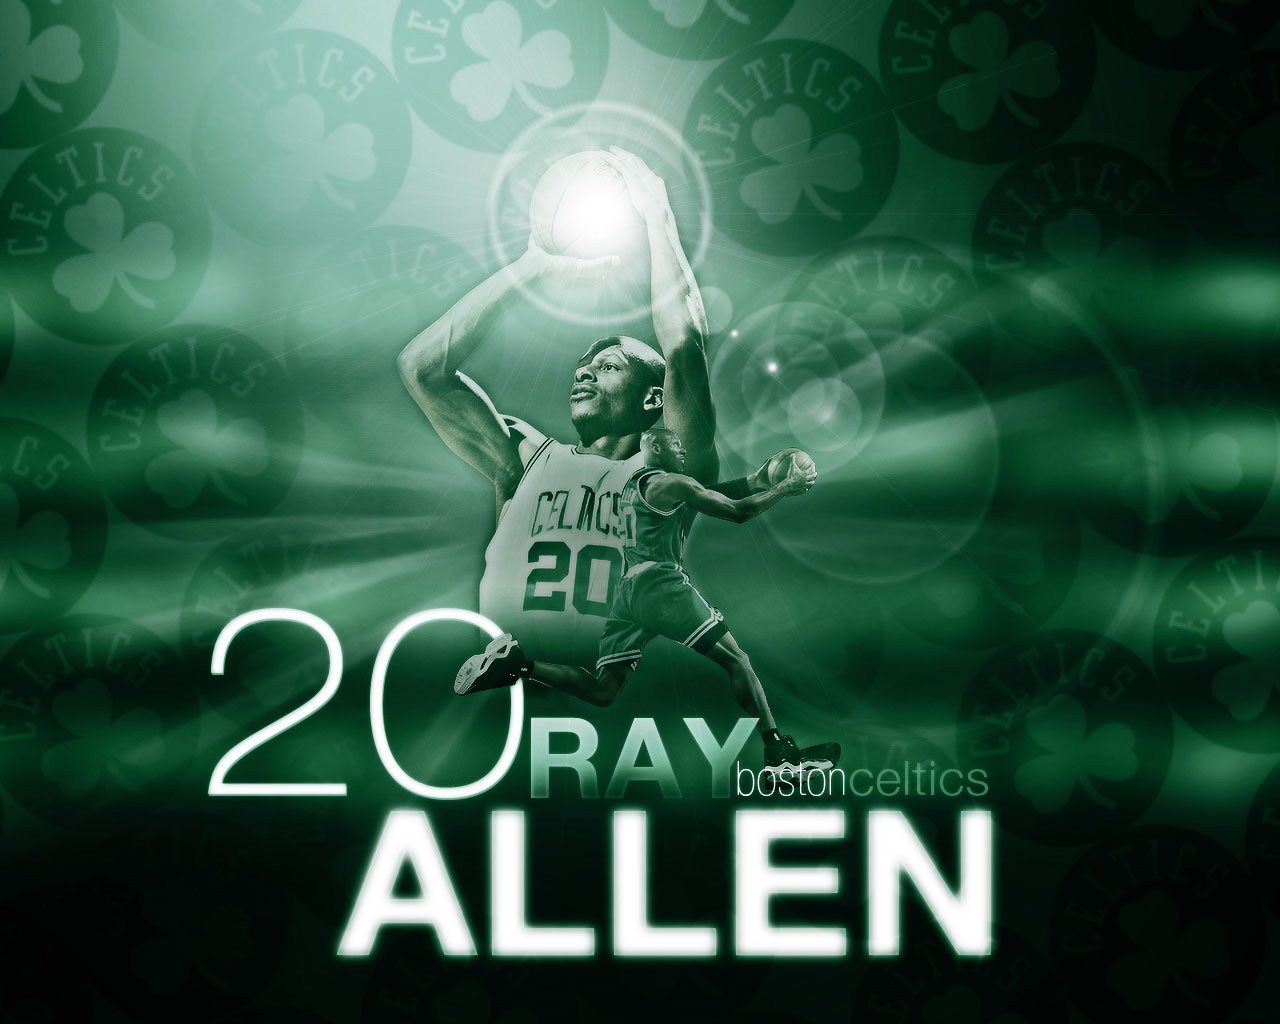 http://4.bp.blogspot.com/_0_IbsH3Iw48/TNTk8yrprGI/AAAAAAAADDU/YqFf-eoEMSk/s1600/Ray-Allen-Celtics-No-20-Wallpaper.jpg